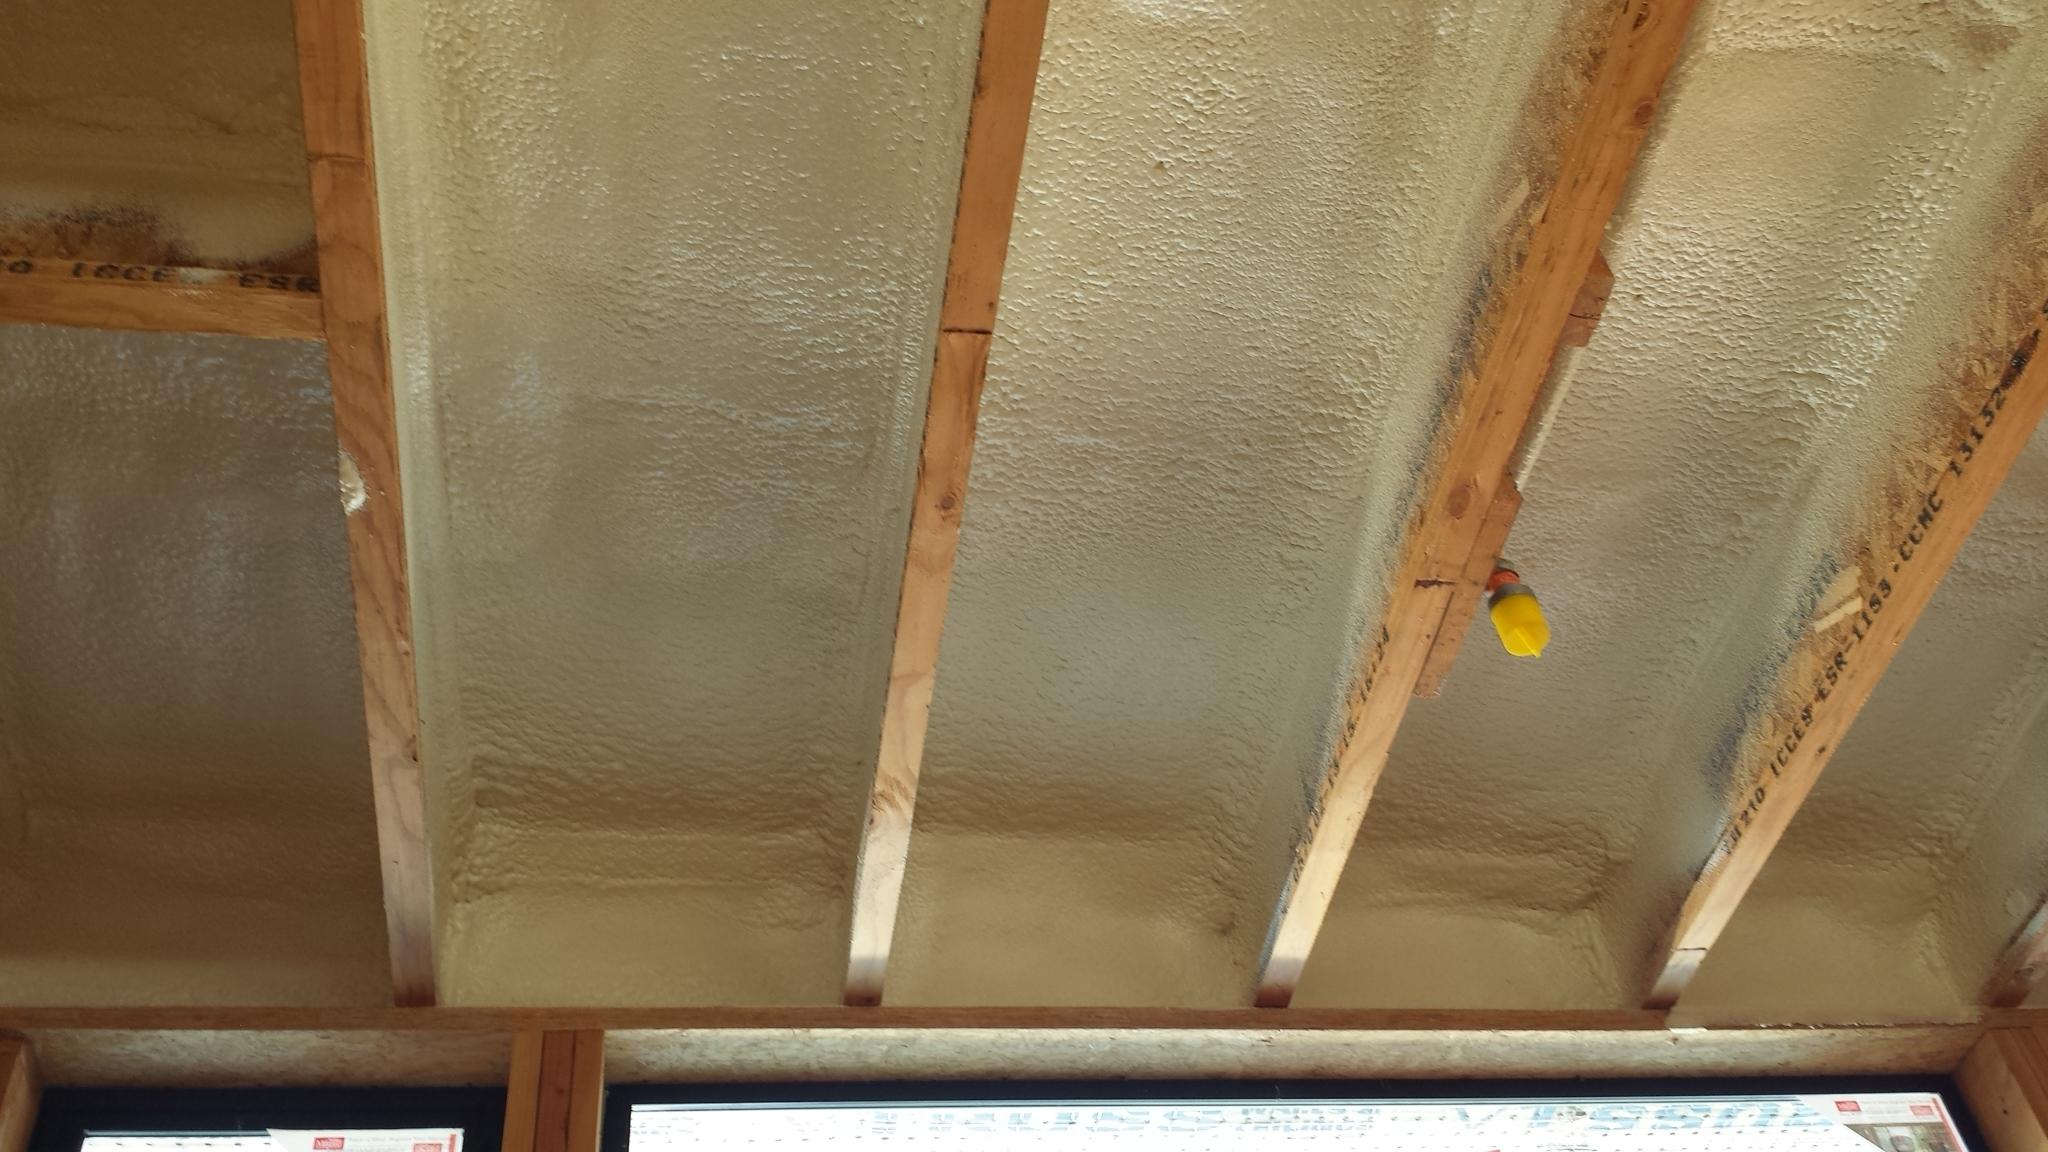 Spray Foam Insulation — keith messick   ARCHITECTURE